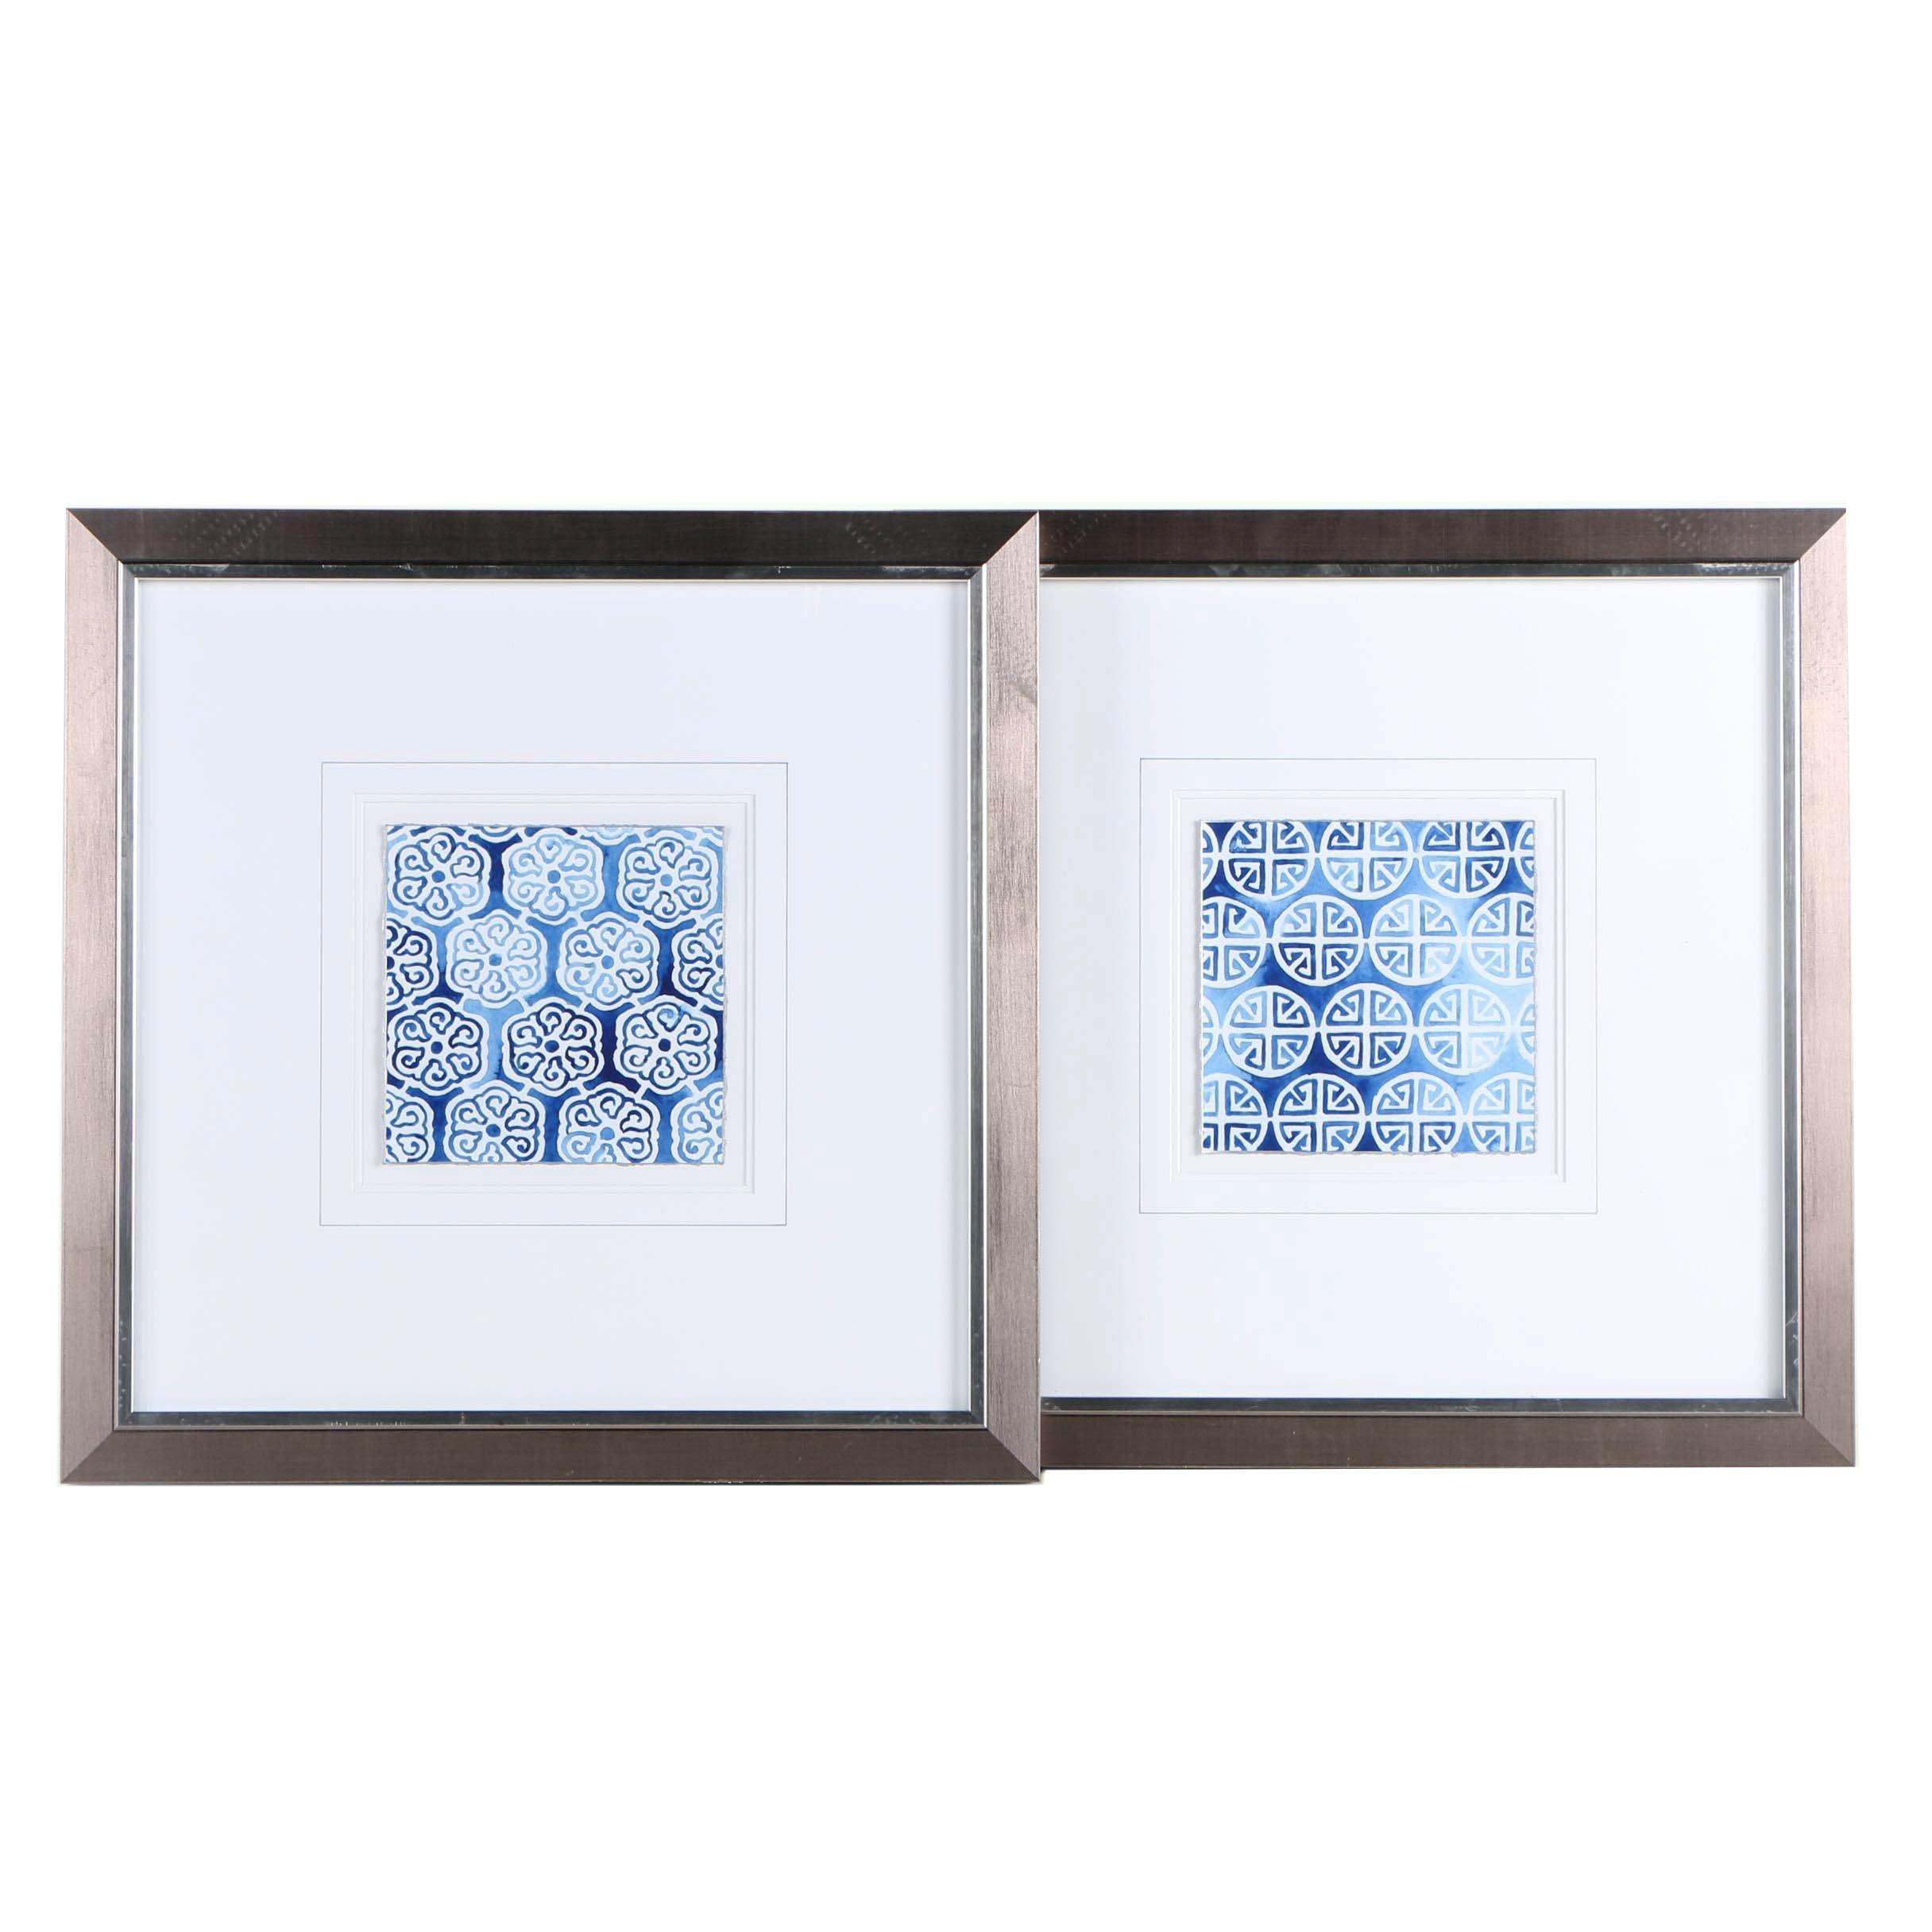 Giclée Prints on Paper of Geometric Patterns